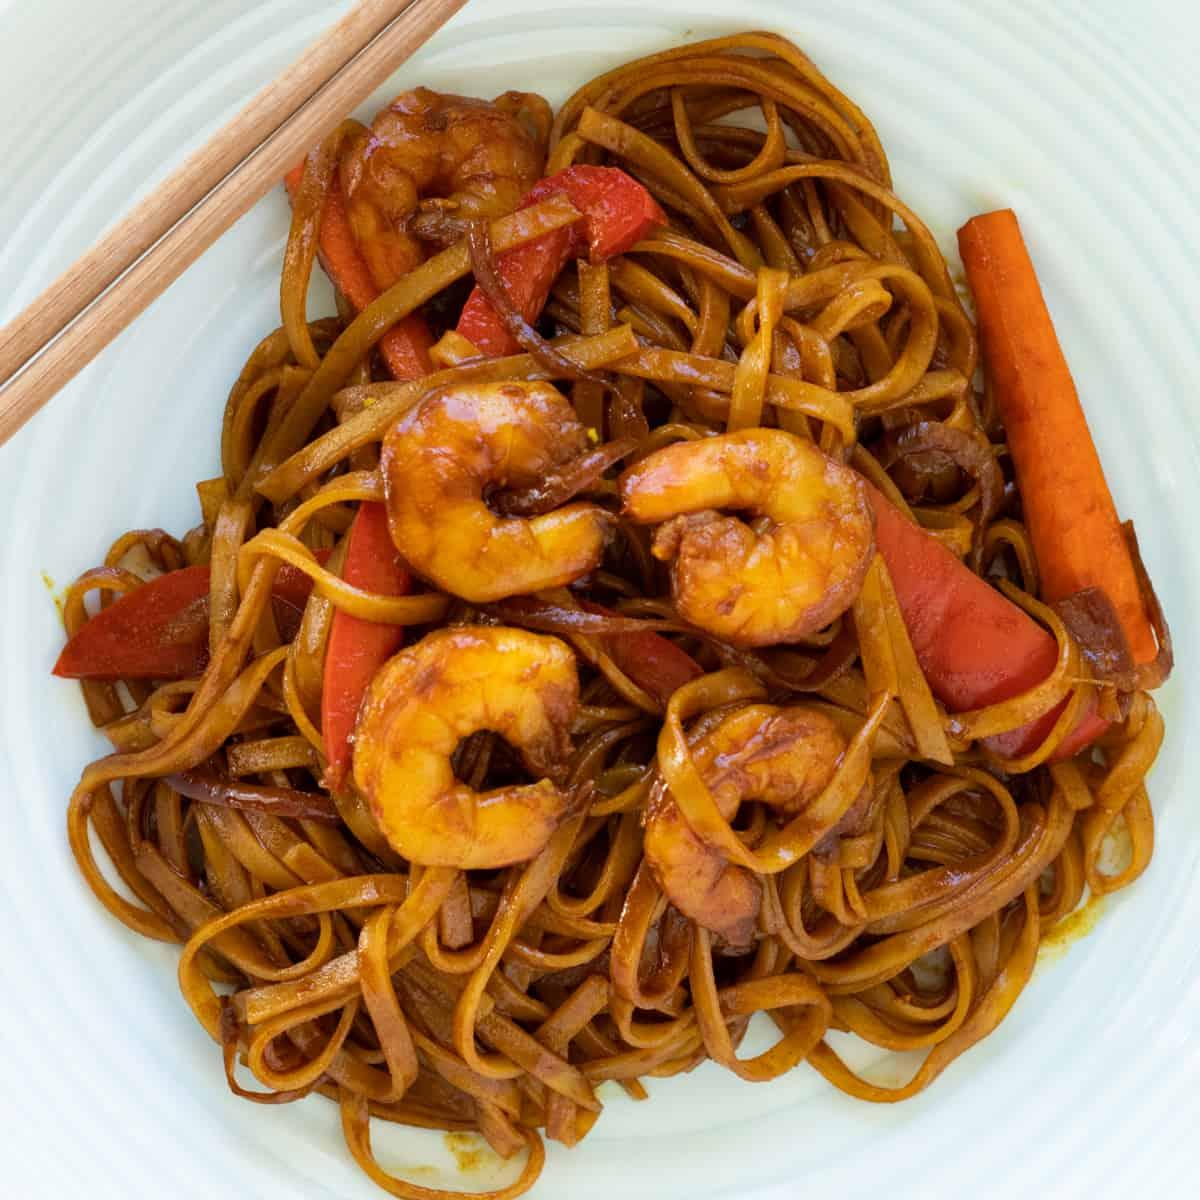 shrimp mei fun on a plate with chopsticks